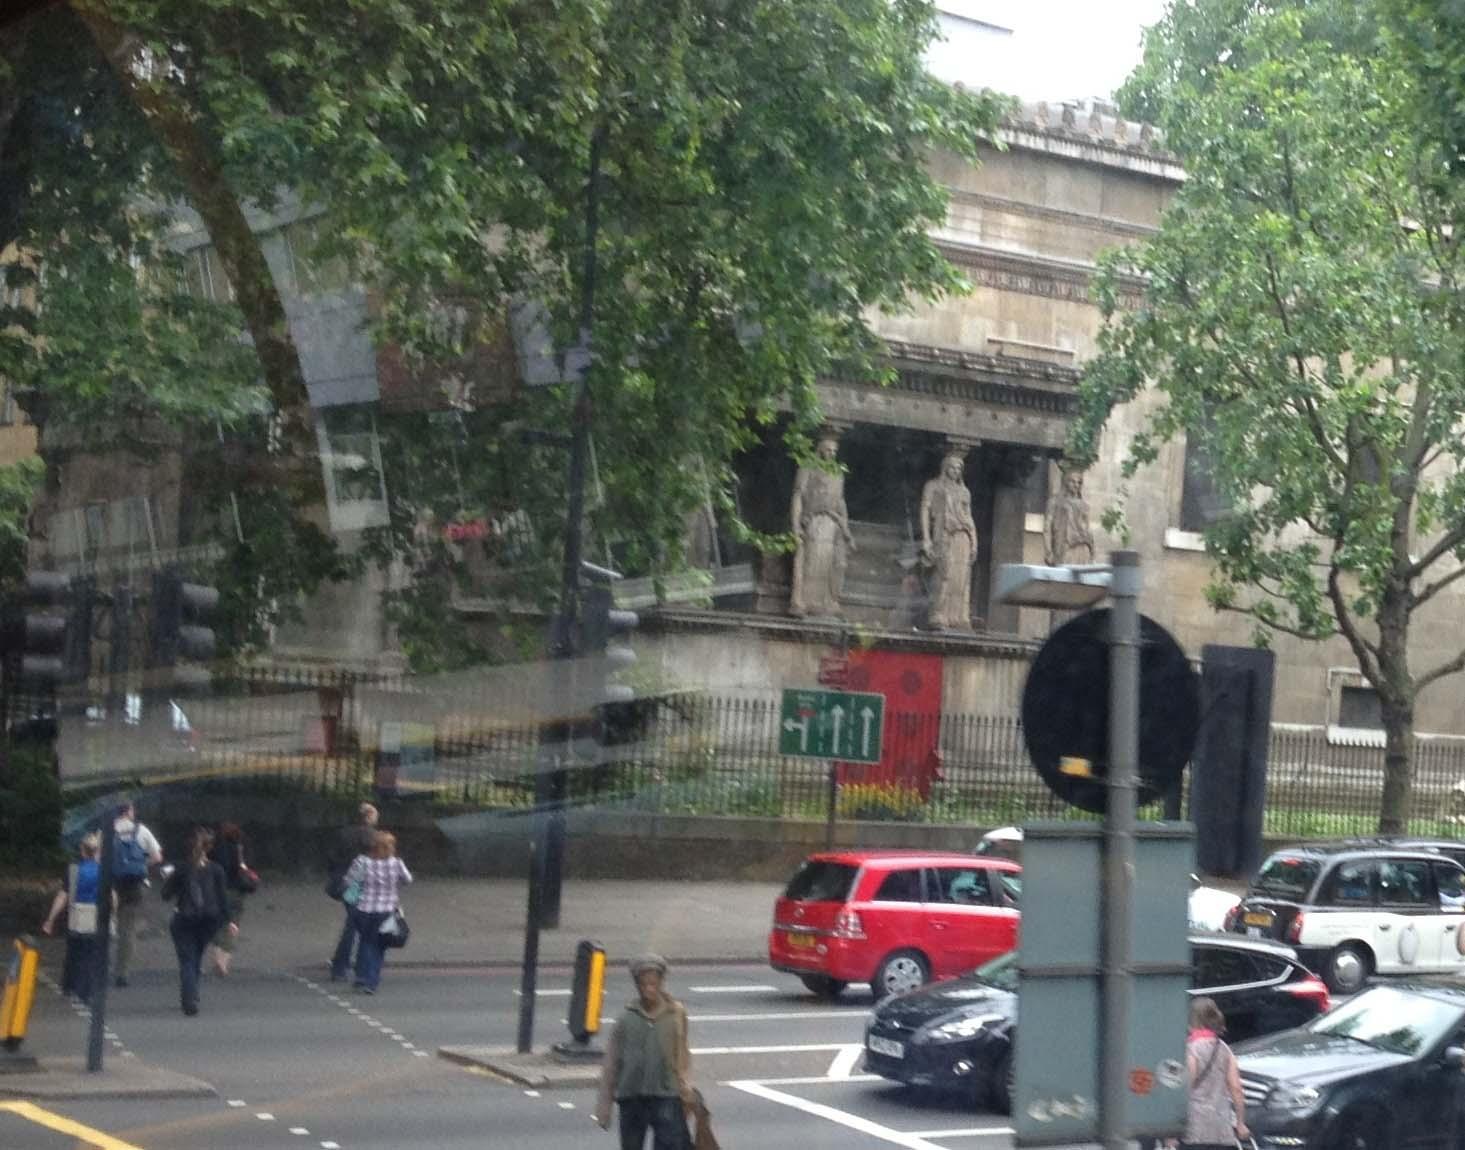 Caryatids on St Pancras New Church